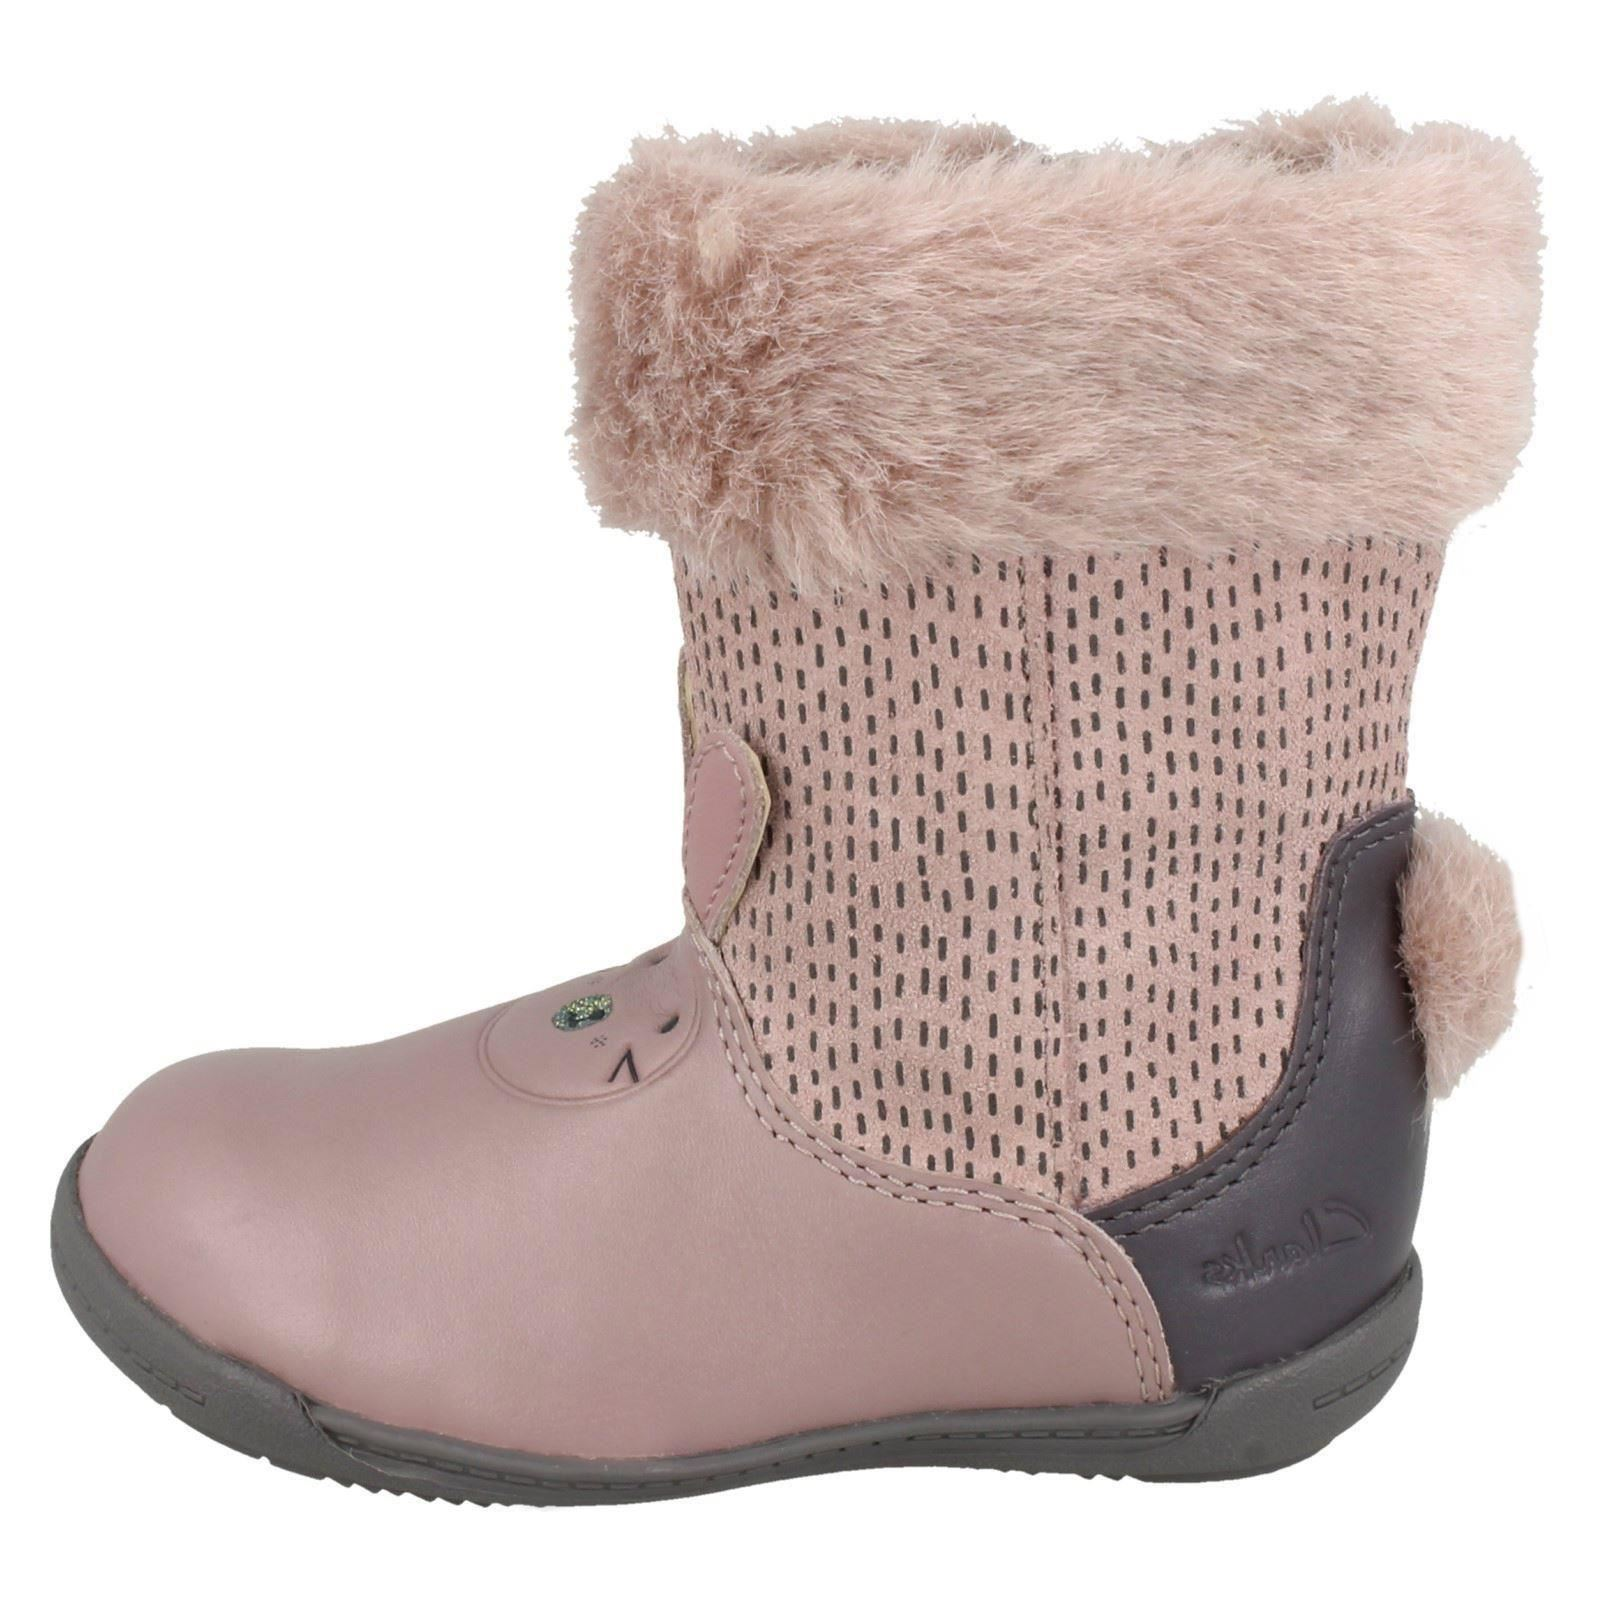 Iva Detalle rosa Infant Zip Dusty Dentro Clarks Time Conejo Casual gamuza Girls Pink Cuero de botas de qq74f